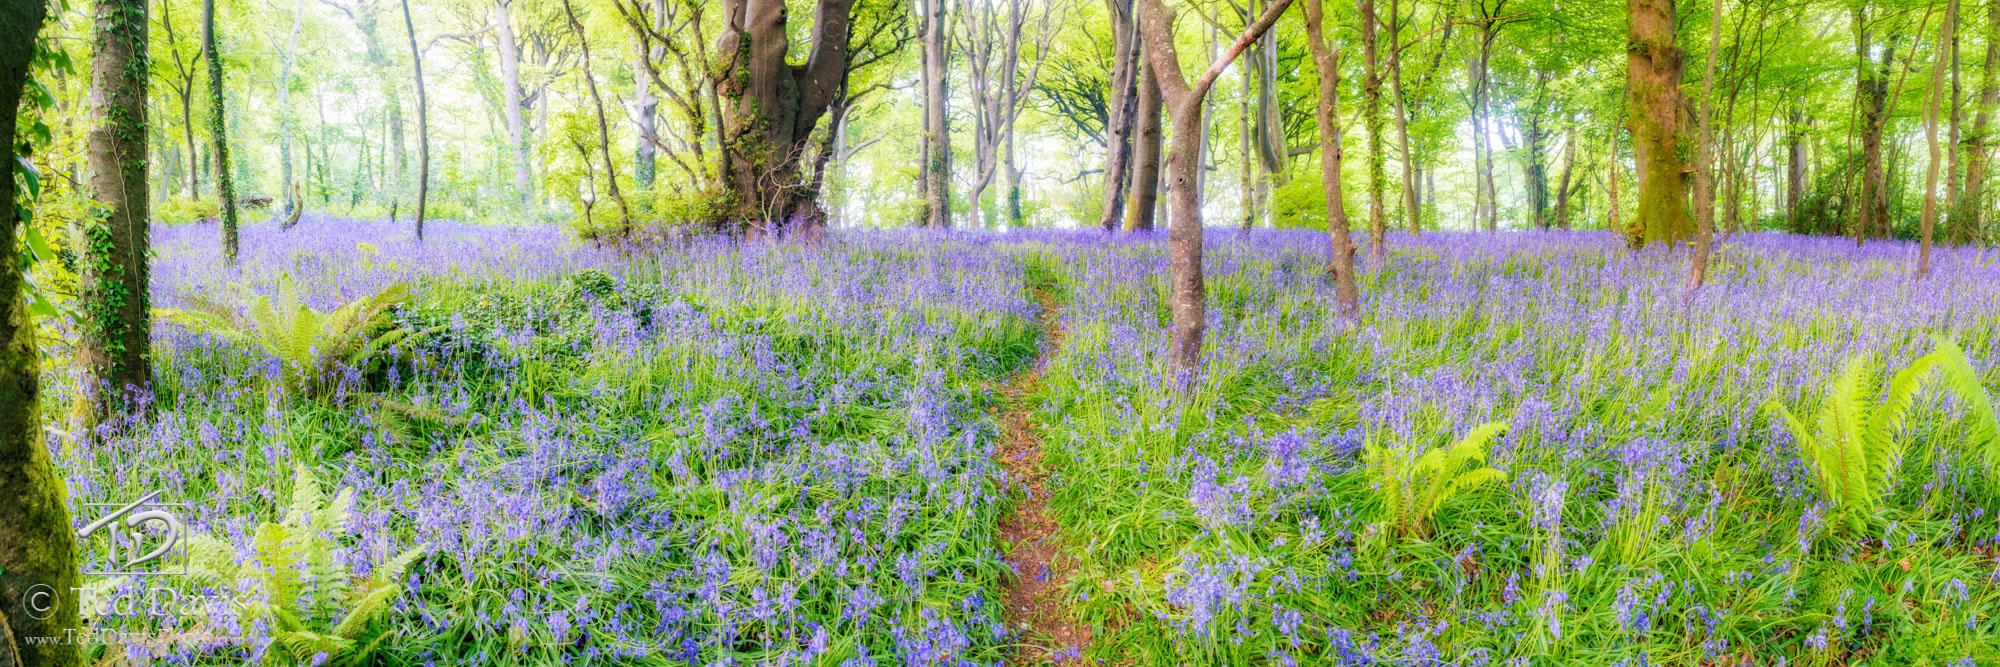 Bluebell Beauty